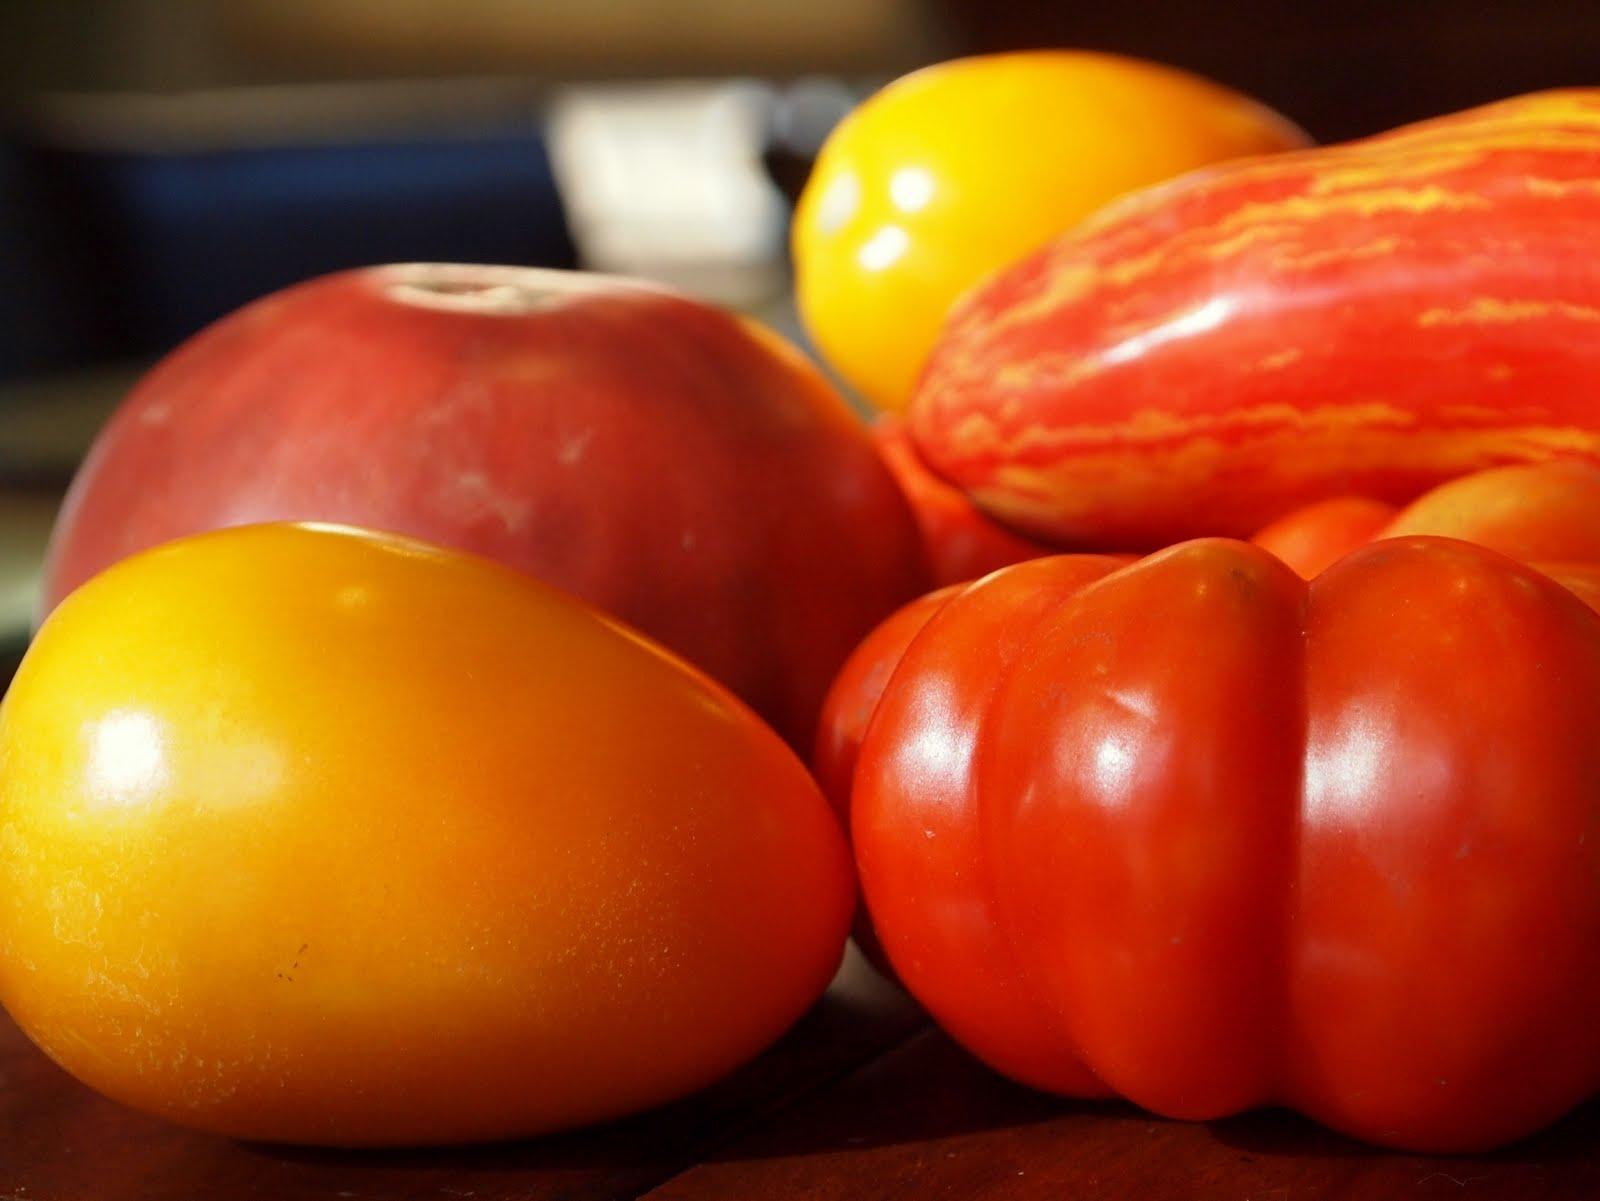 bEATS: Corn and Tomato Pie